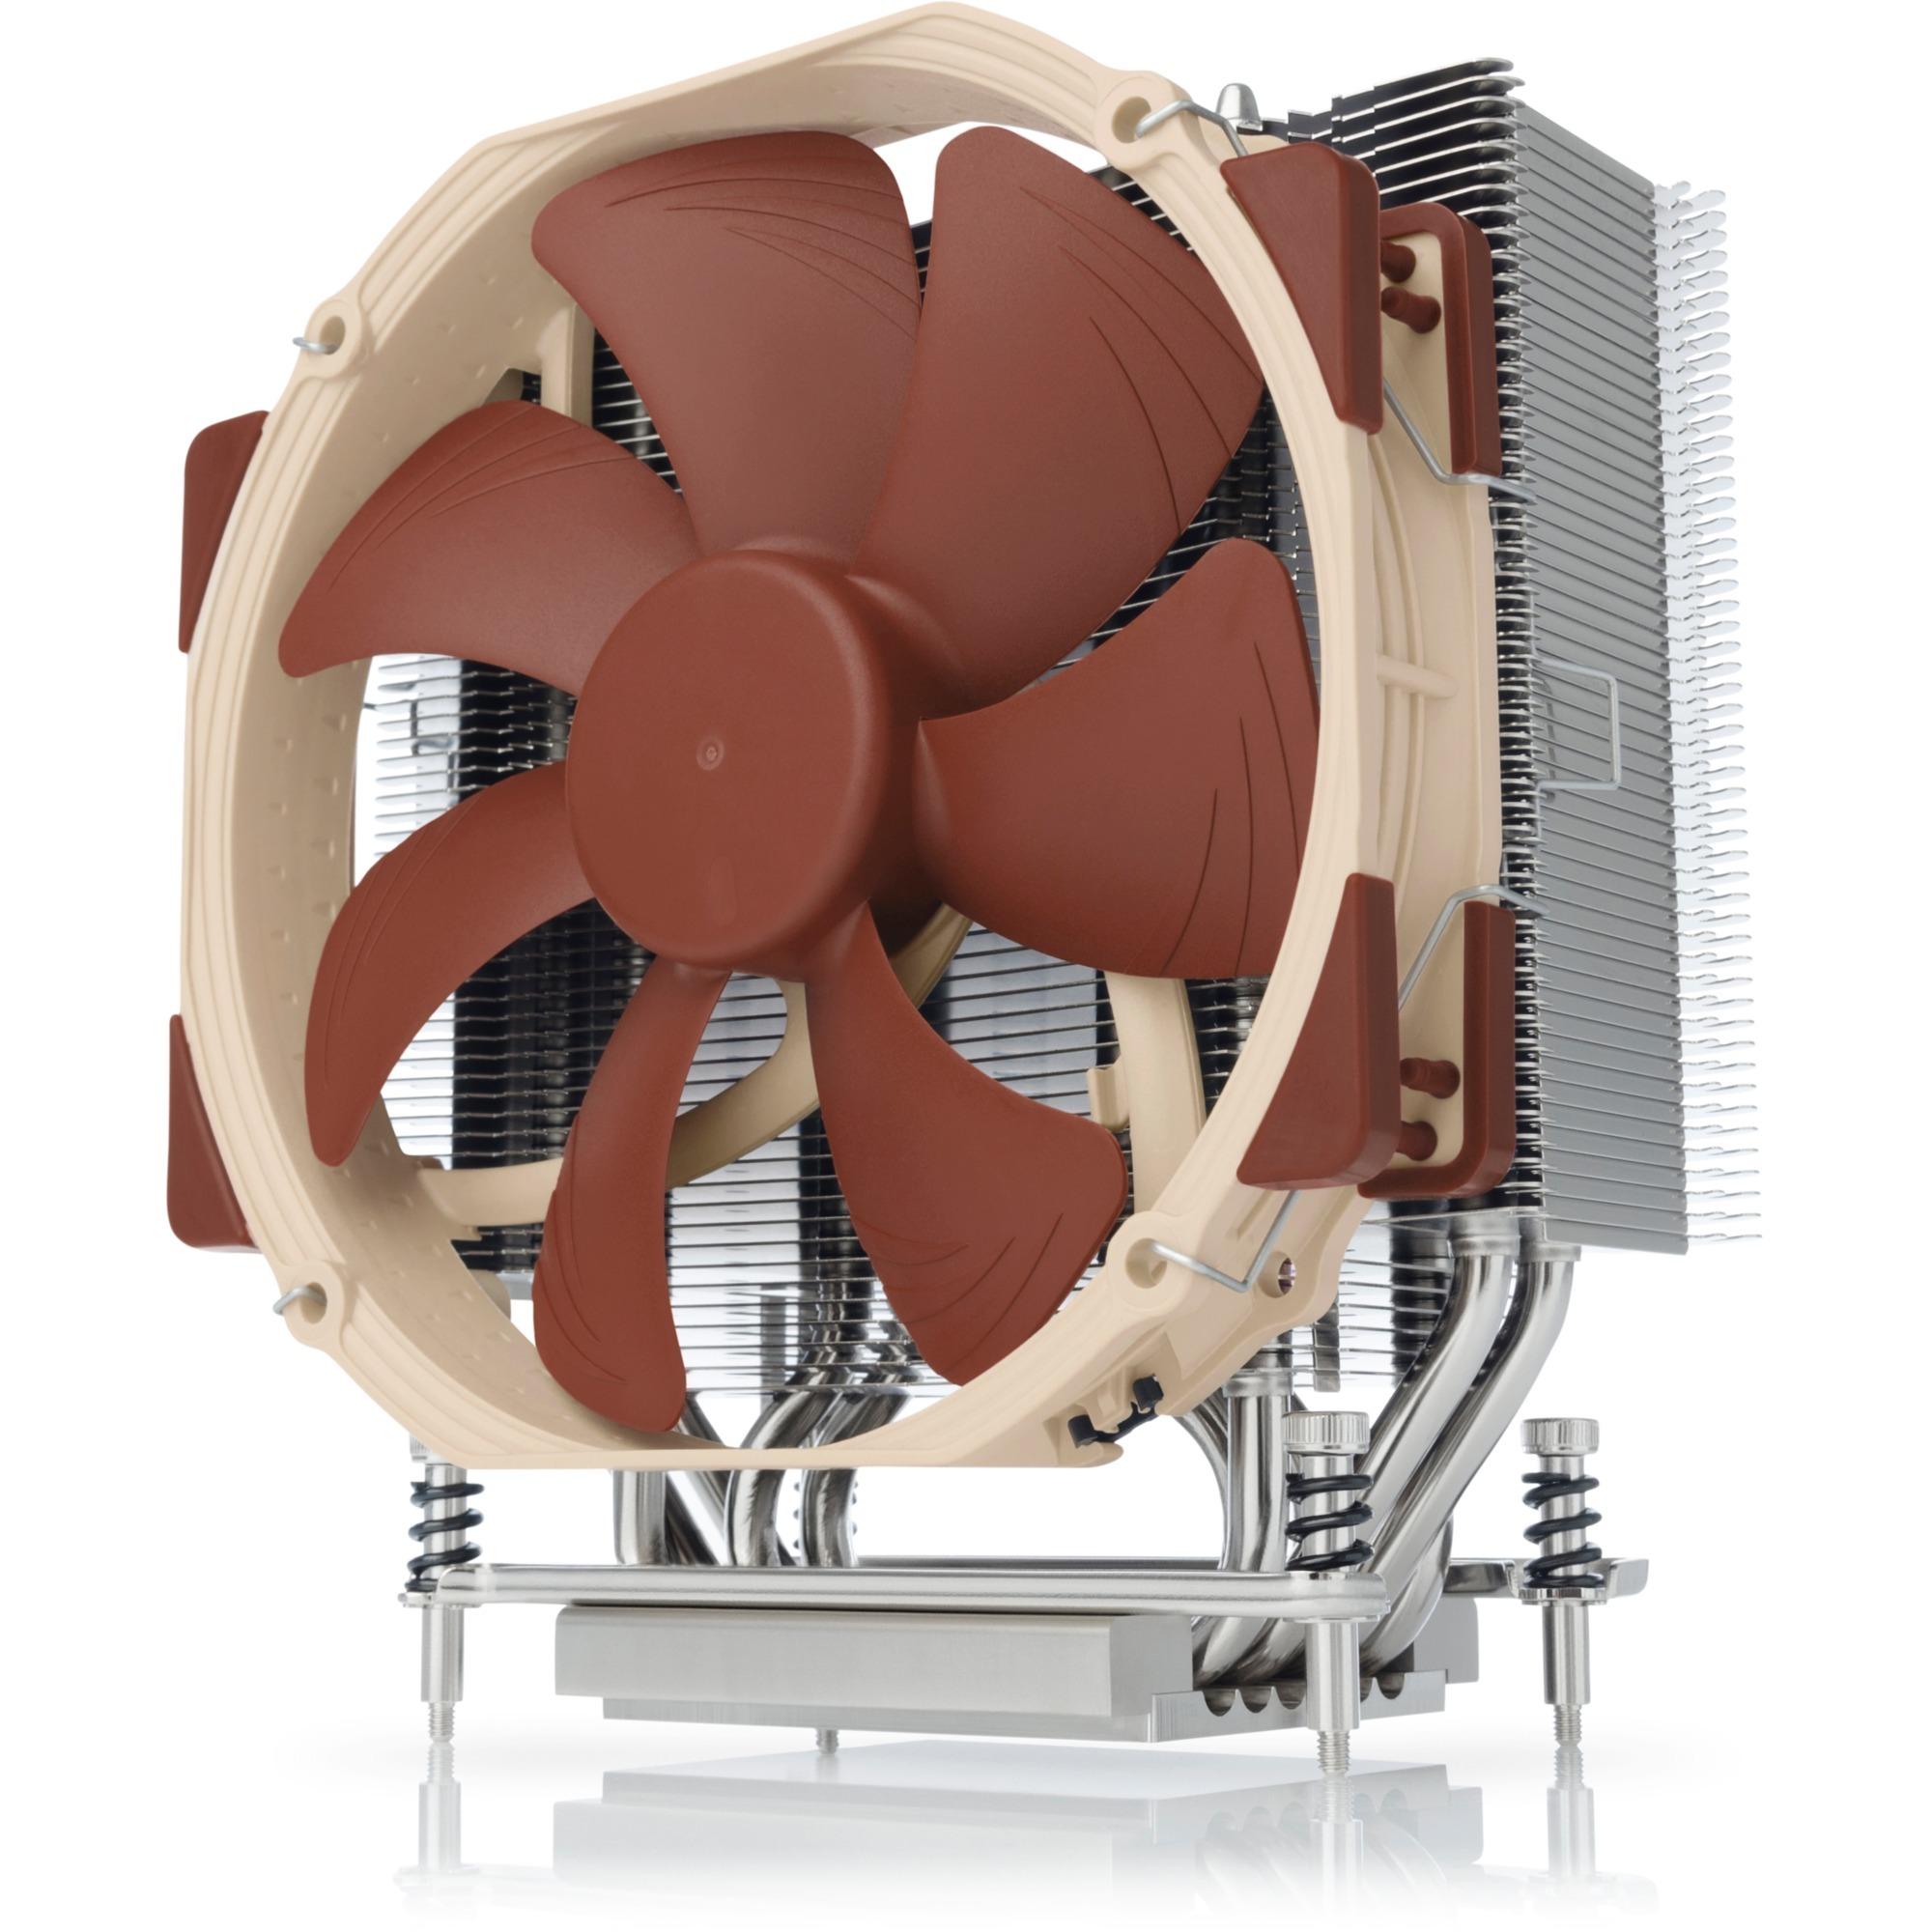 NH-U14S TR4-SP3 Processeur Refroidisseur ventilateur, refroidisseur et radiateur, Ventirad